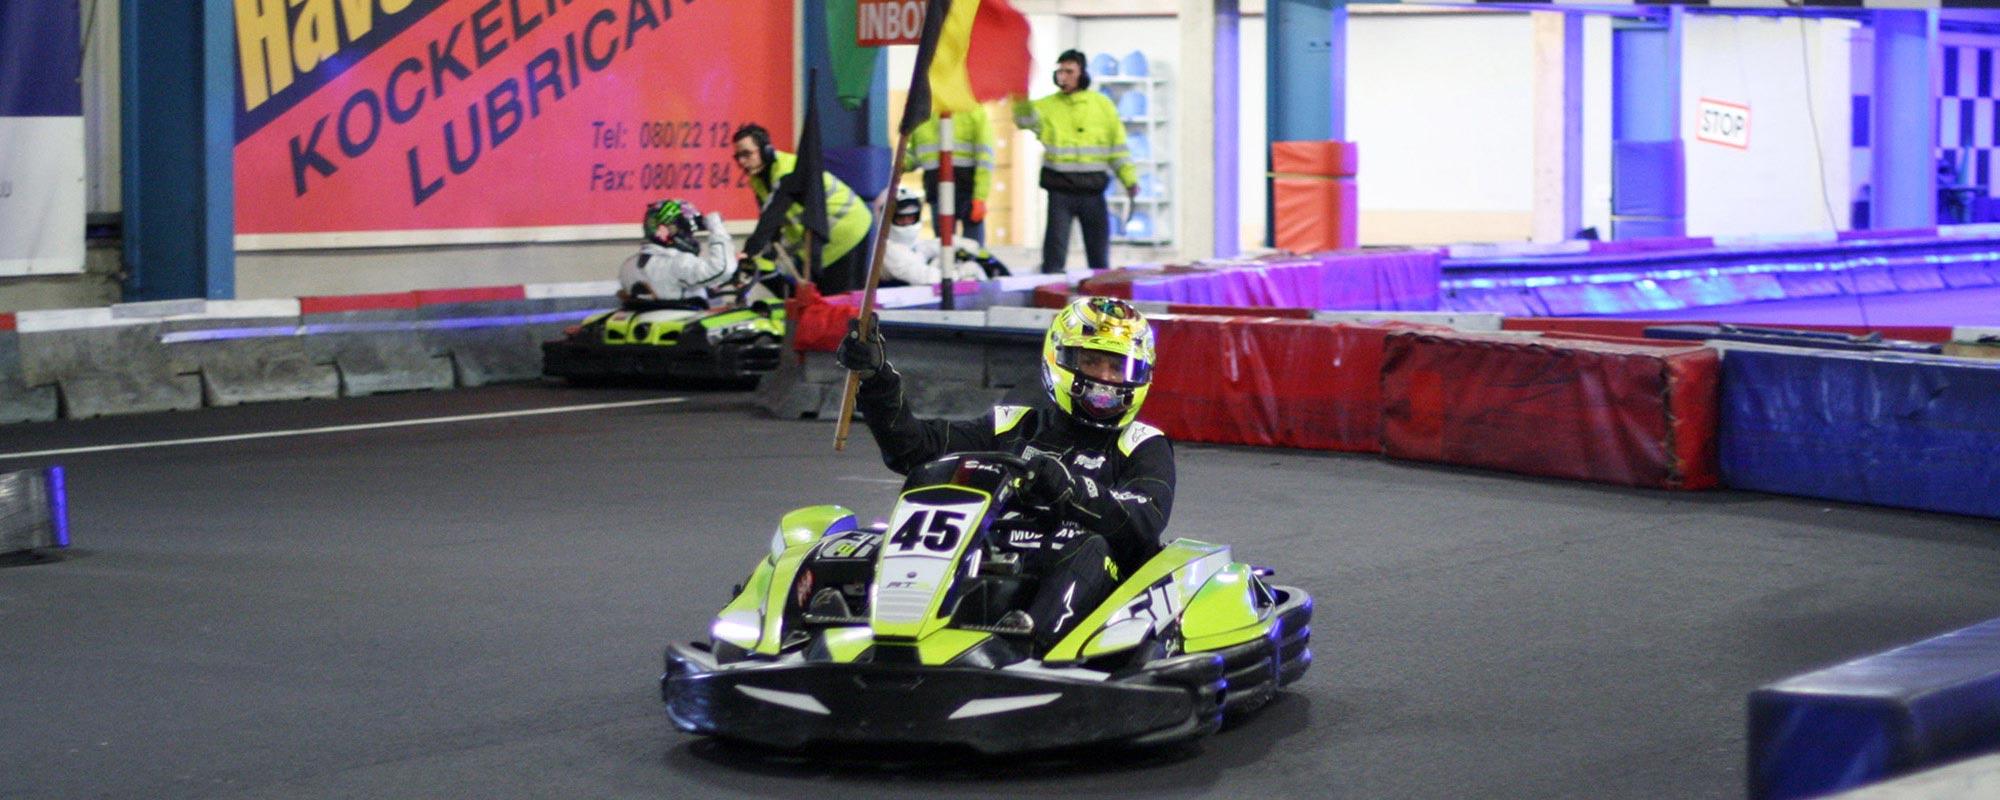 ebafkc-karting-2000x800-13